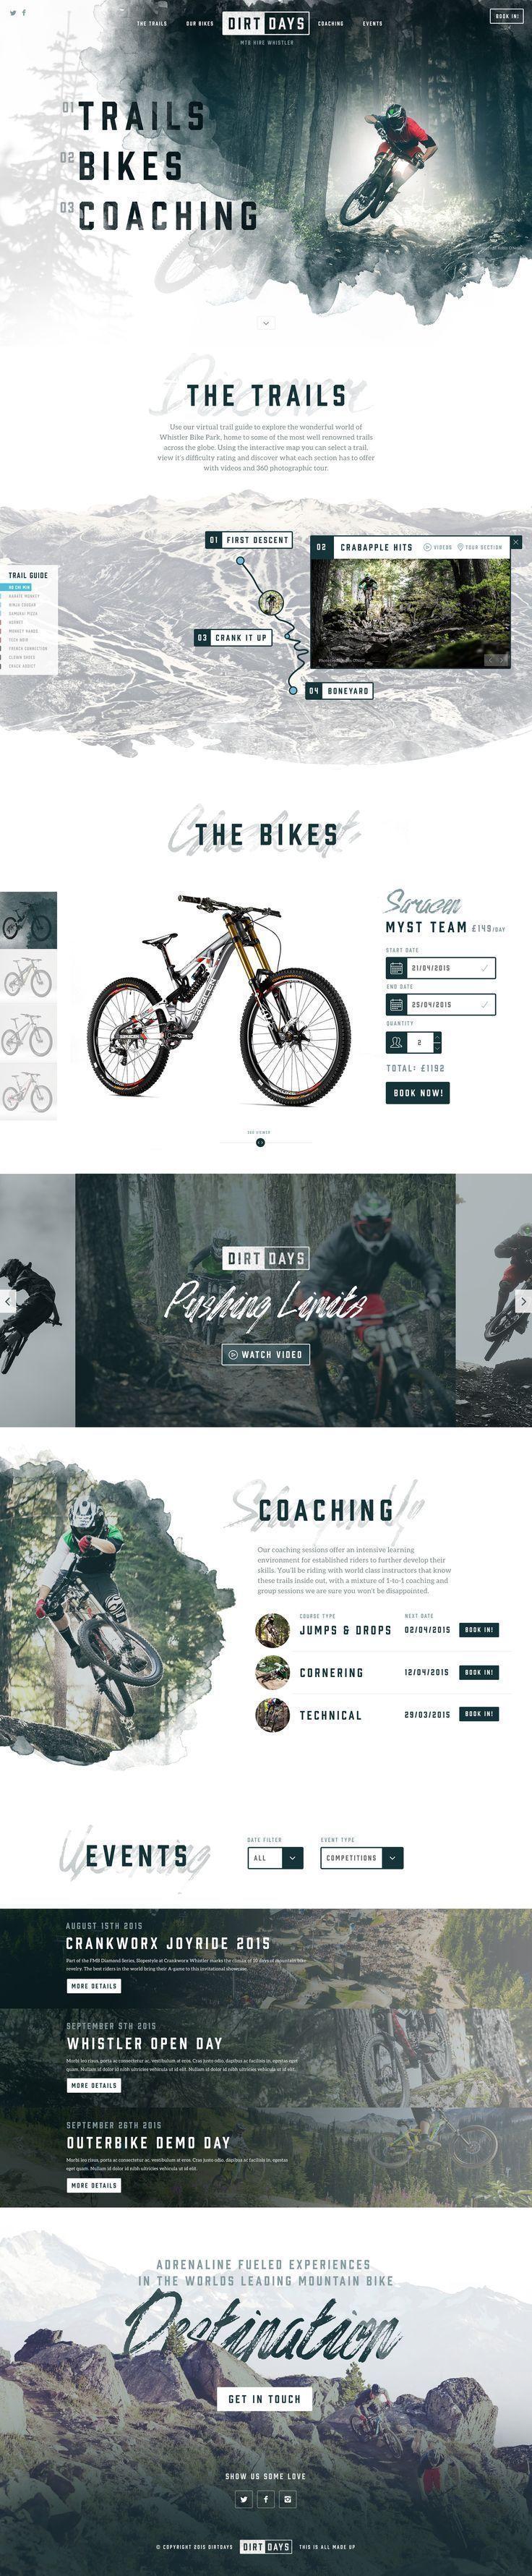 Trailer bike design = = = FREE CONSULTATION! Get similar web design service @ http://smallstereo.com